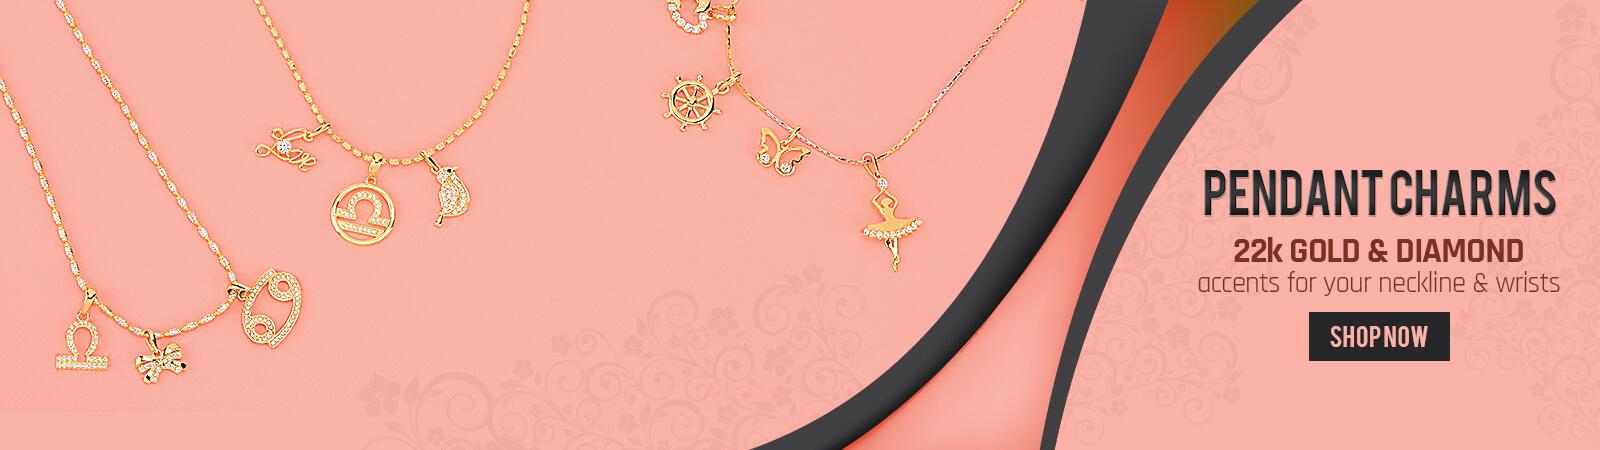 22k Gold Cz Diamond Charm Pendants